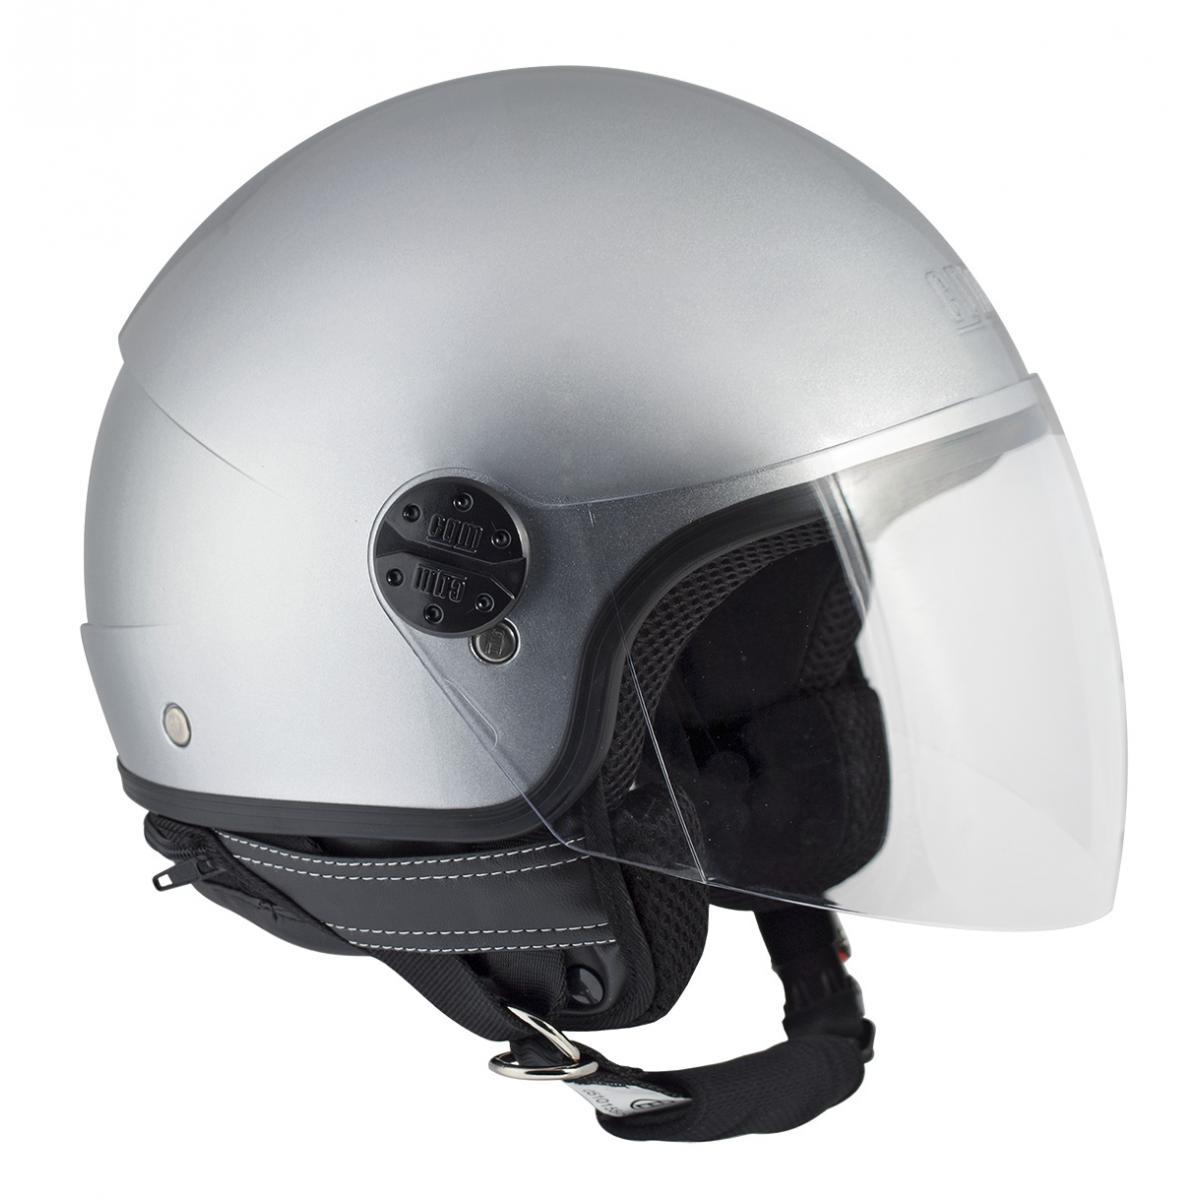 101A-NEVADA gris metal Talla XL